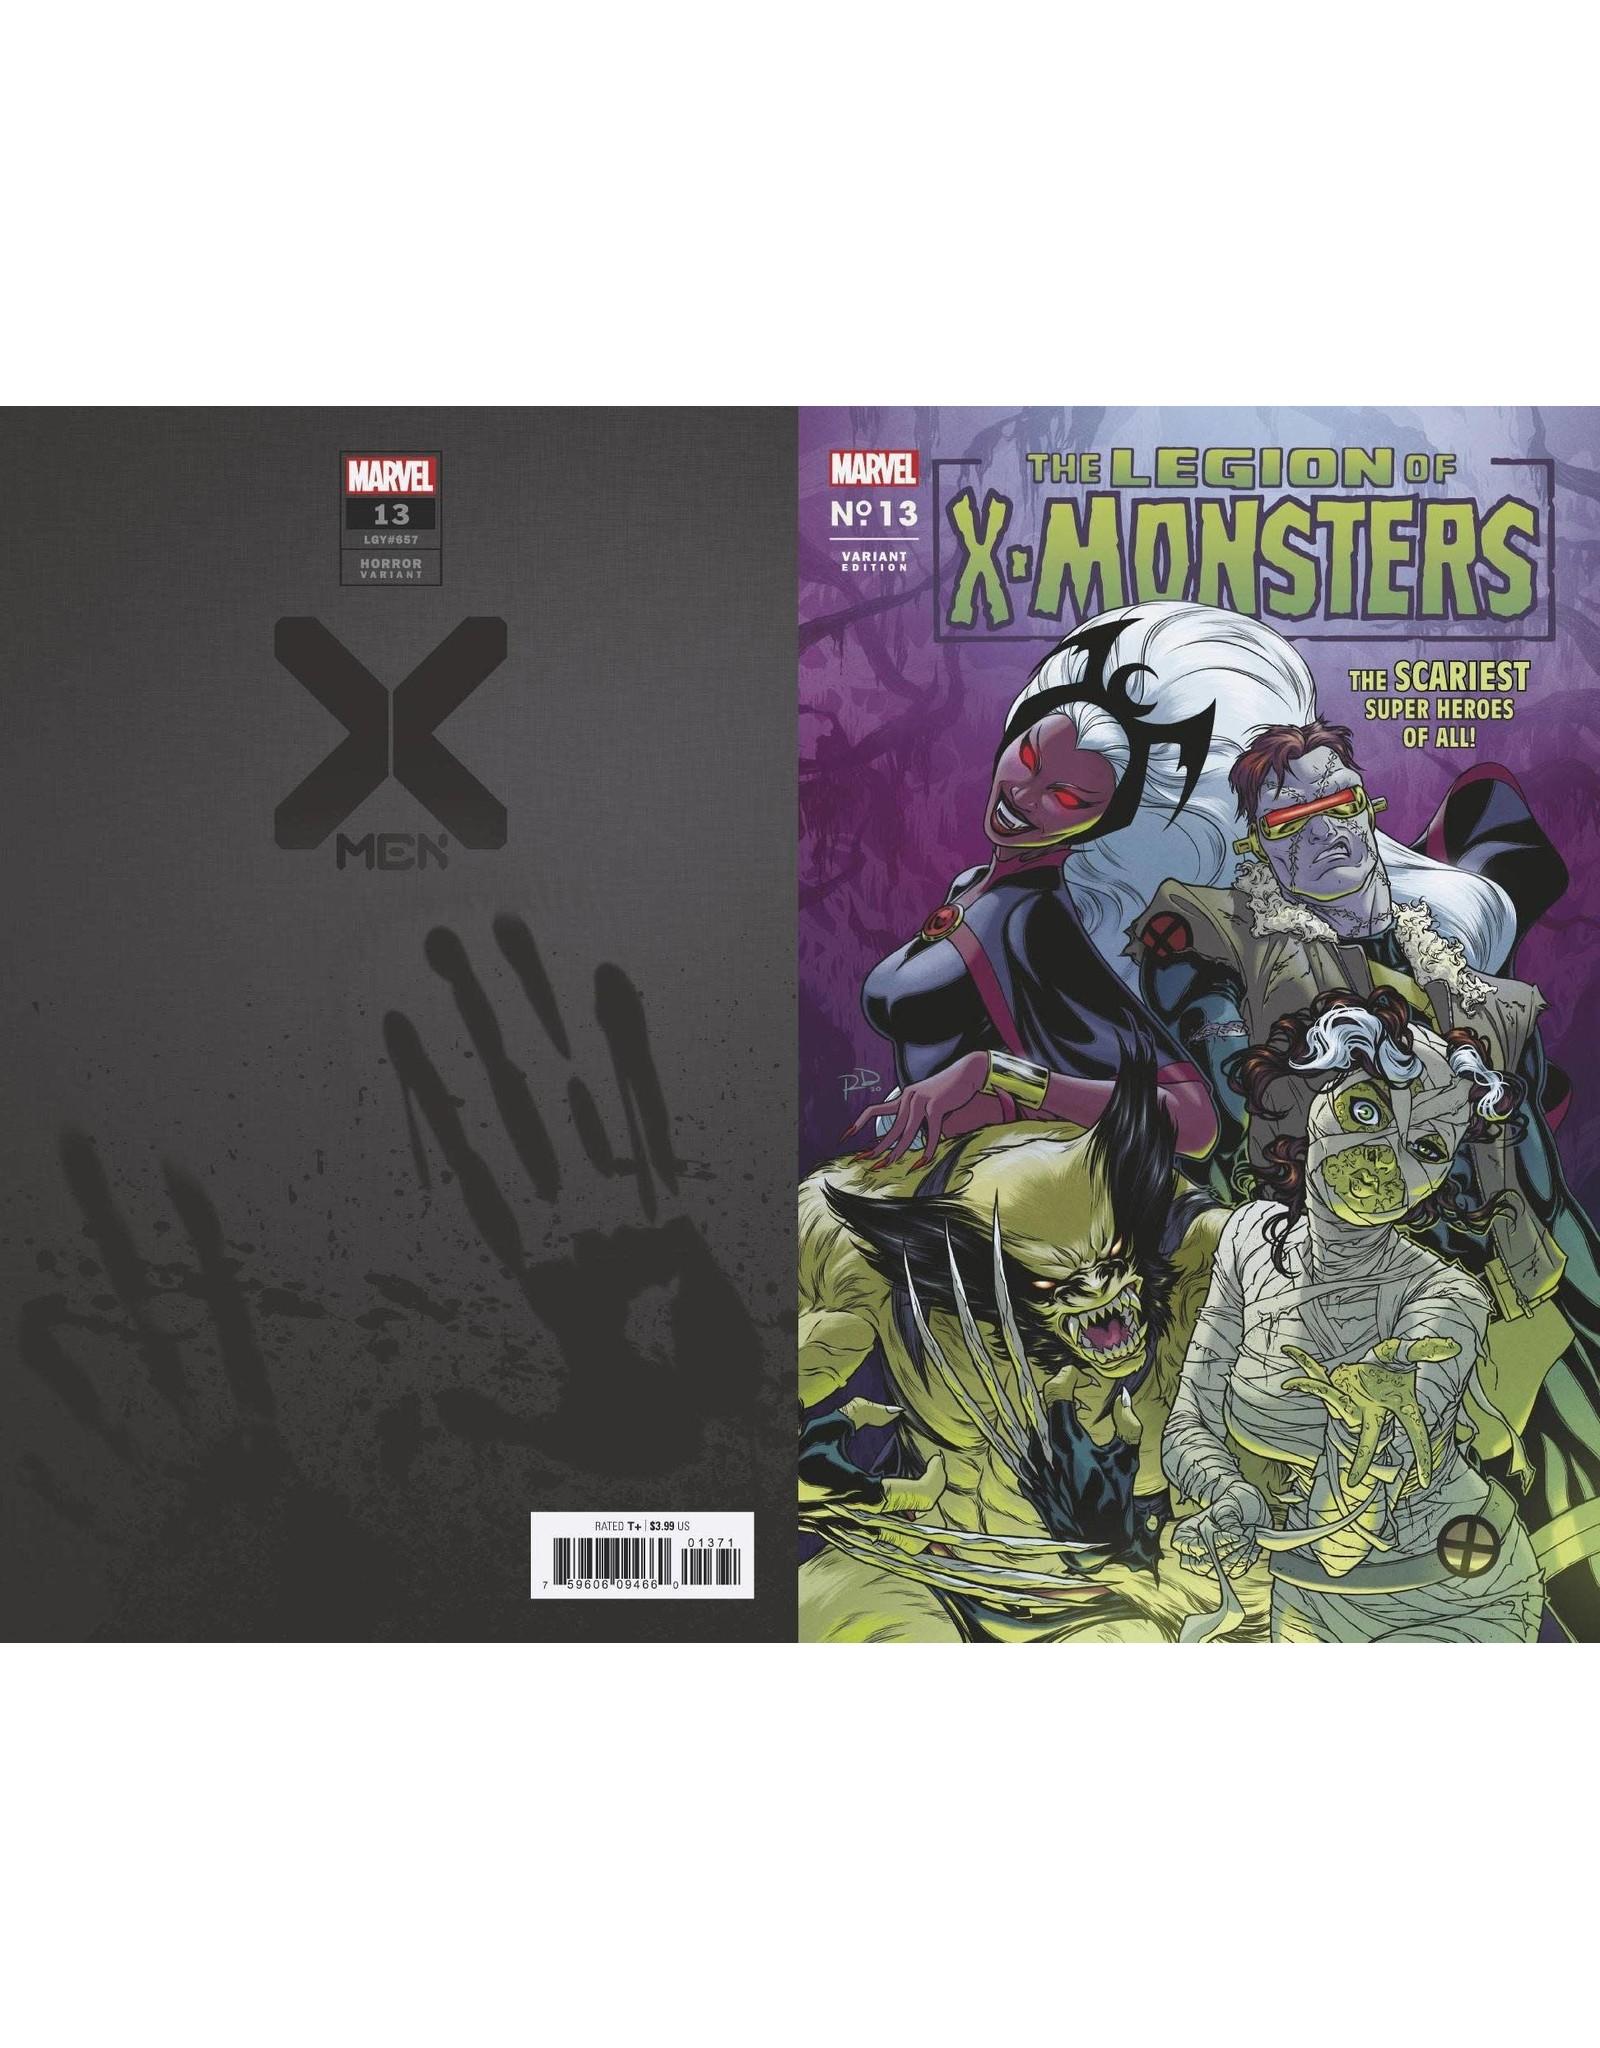 Marvel Comics X-MEN #13 DAUTERMAN LEGION X-MONSTERS HORROR VAR XOS